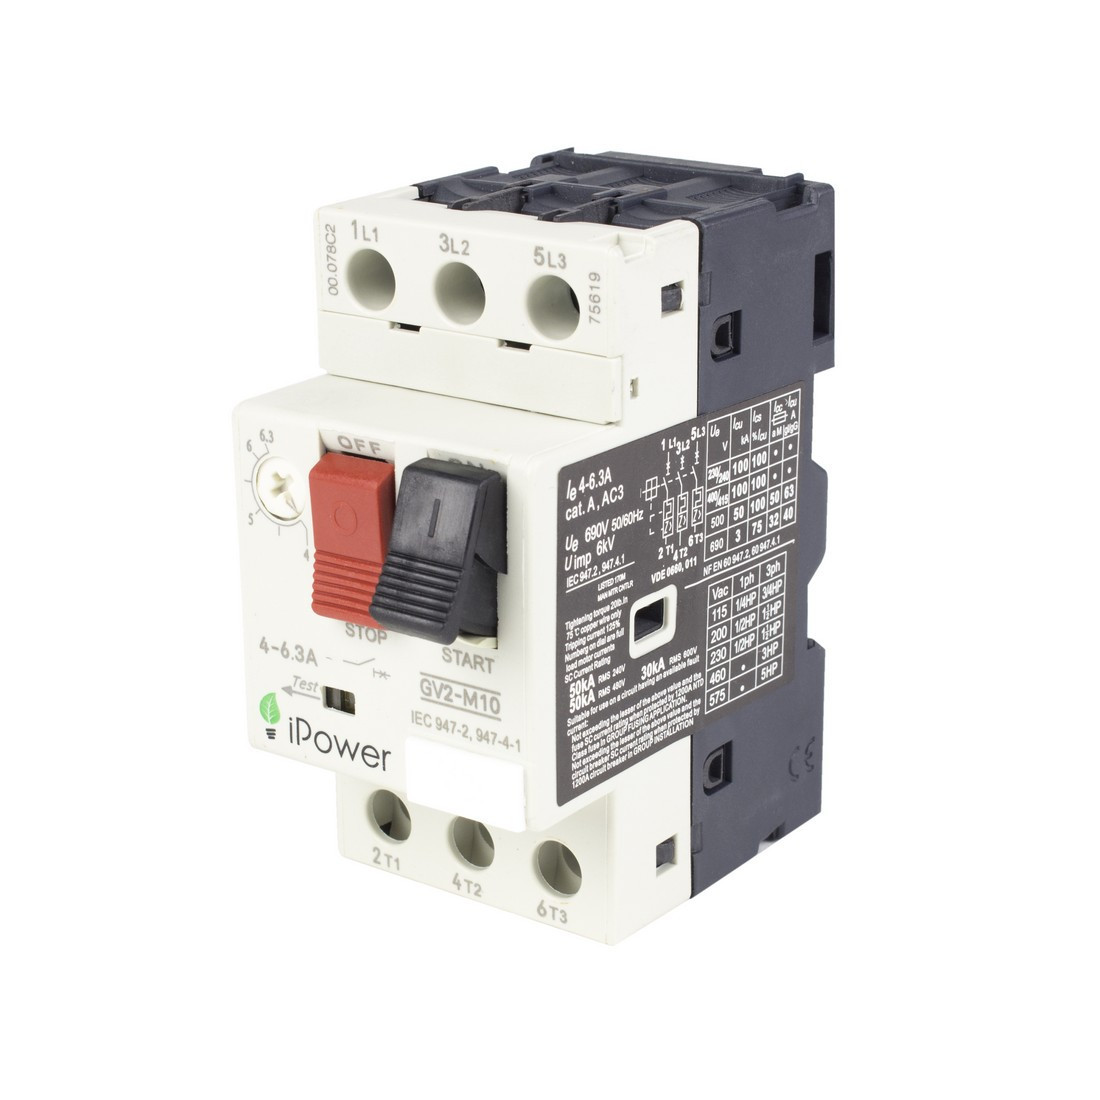 Автомат защиты двигателя iPower GV2-M08 (2.5-4A) - фото 1